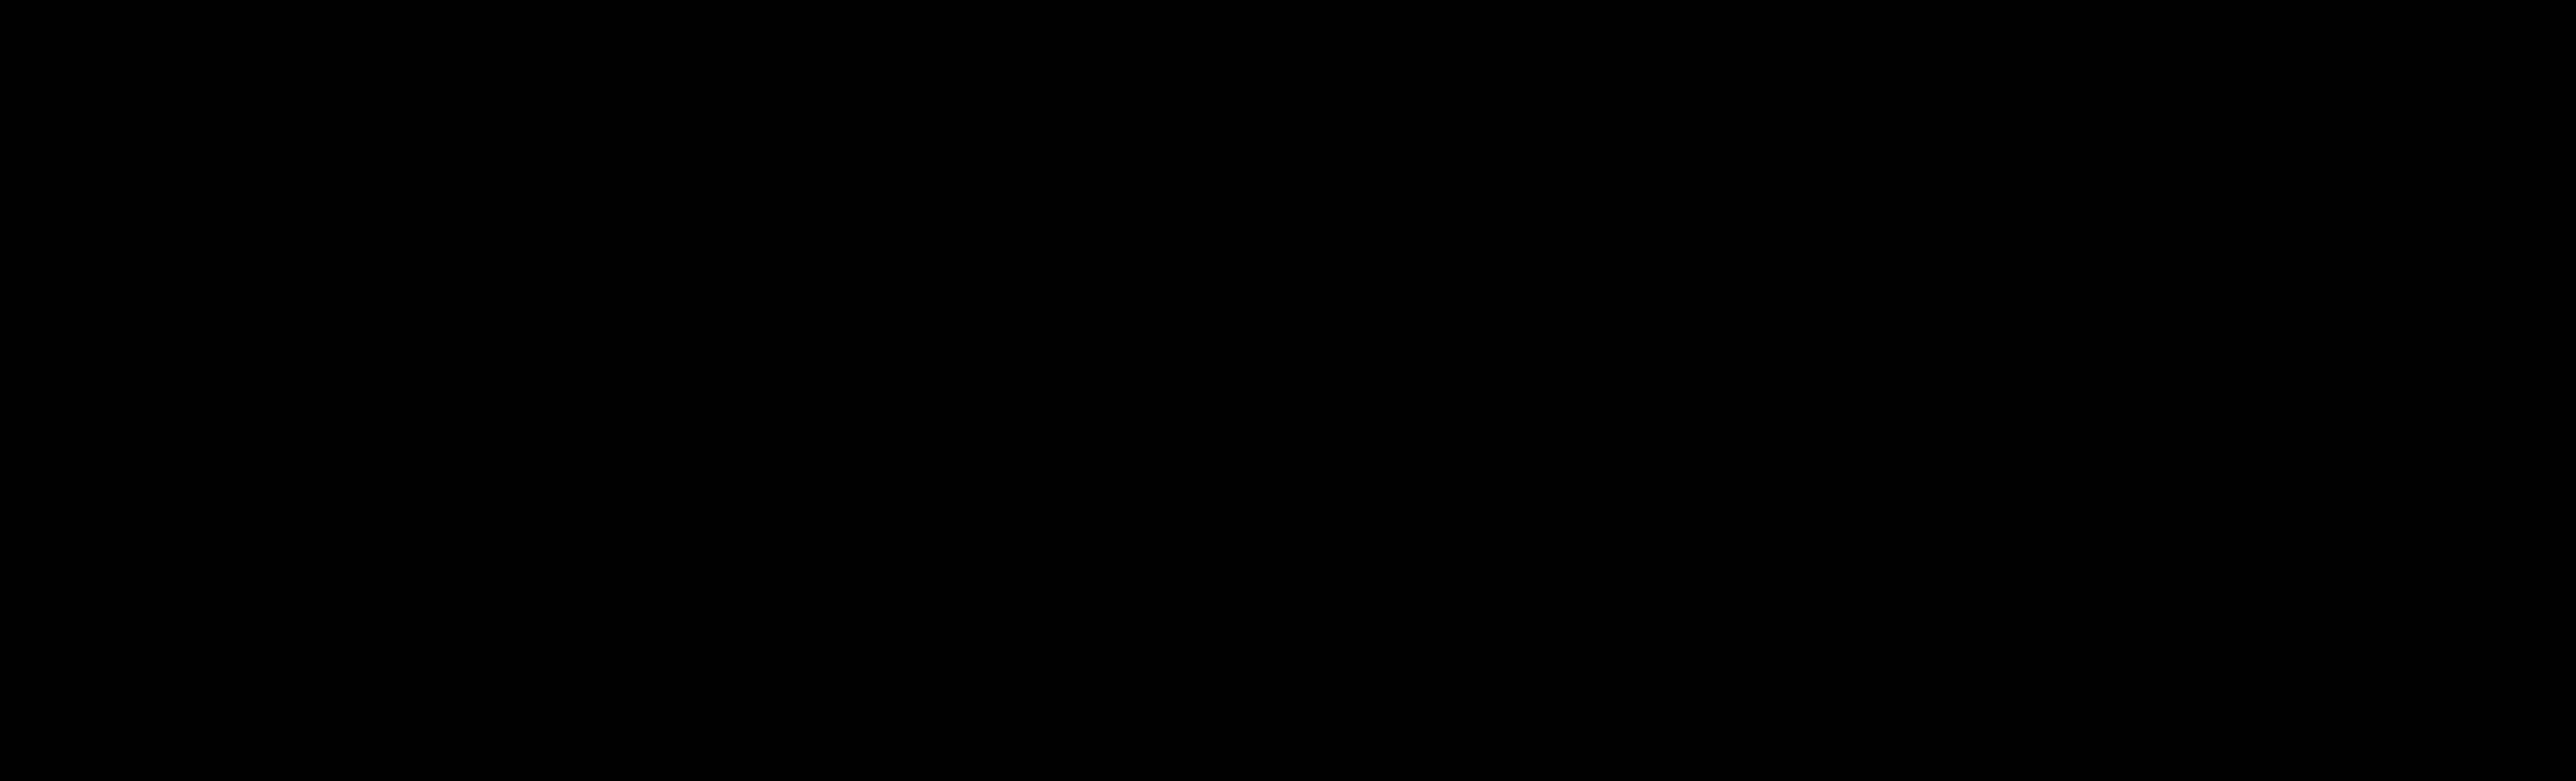 Serifen